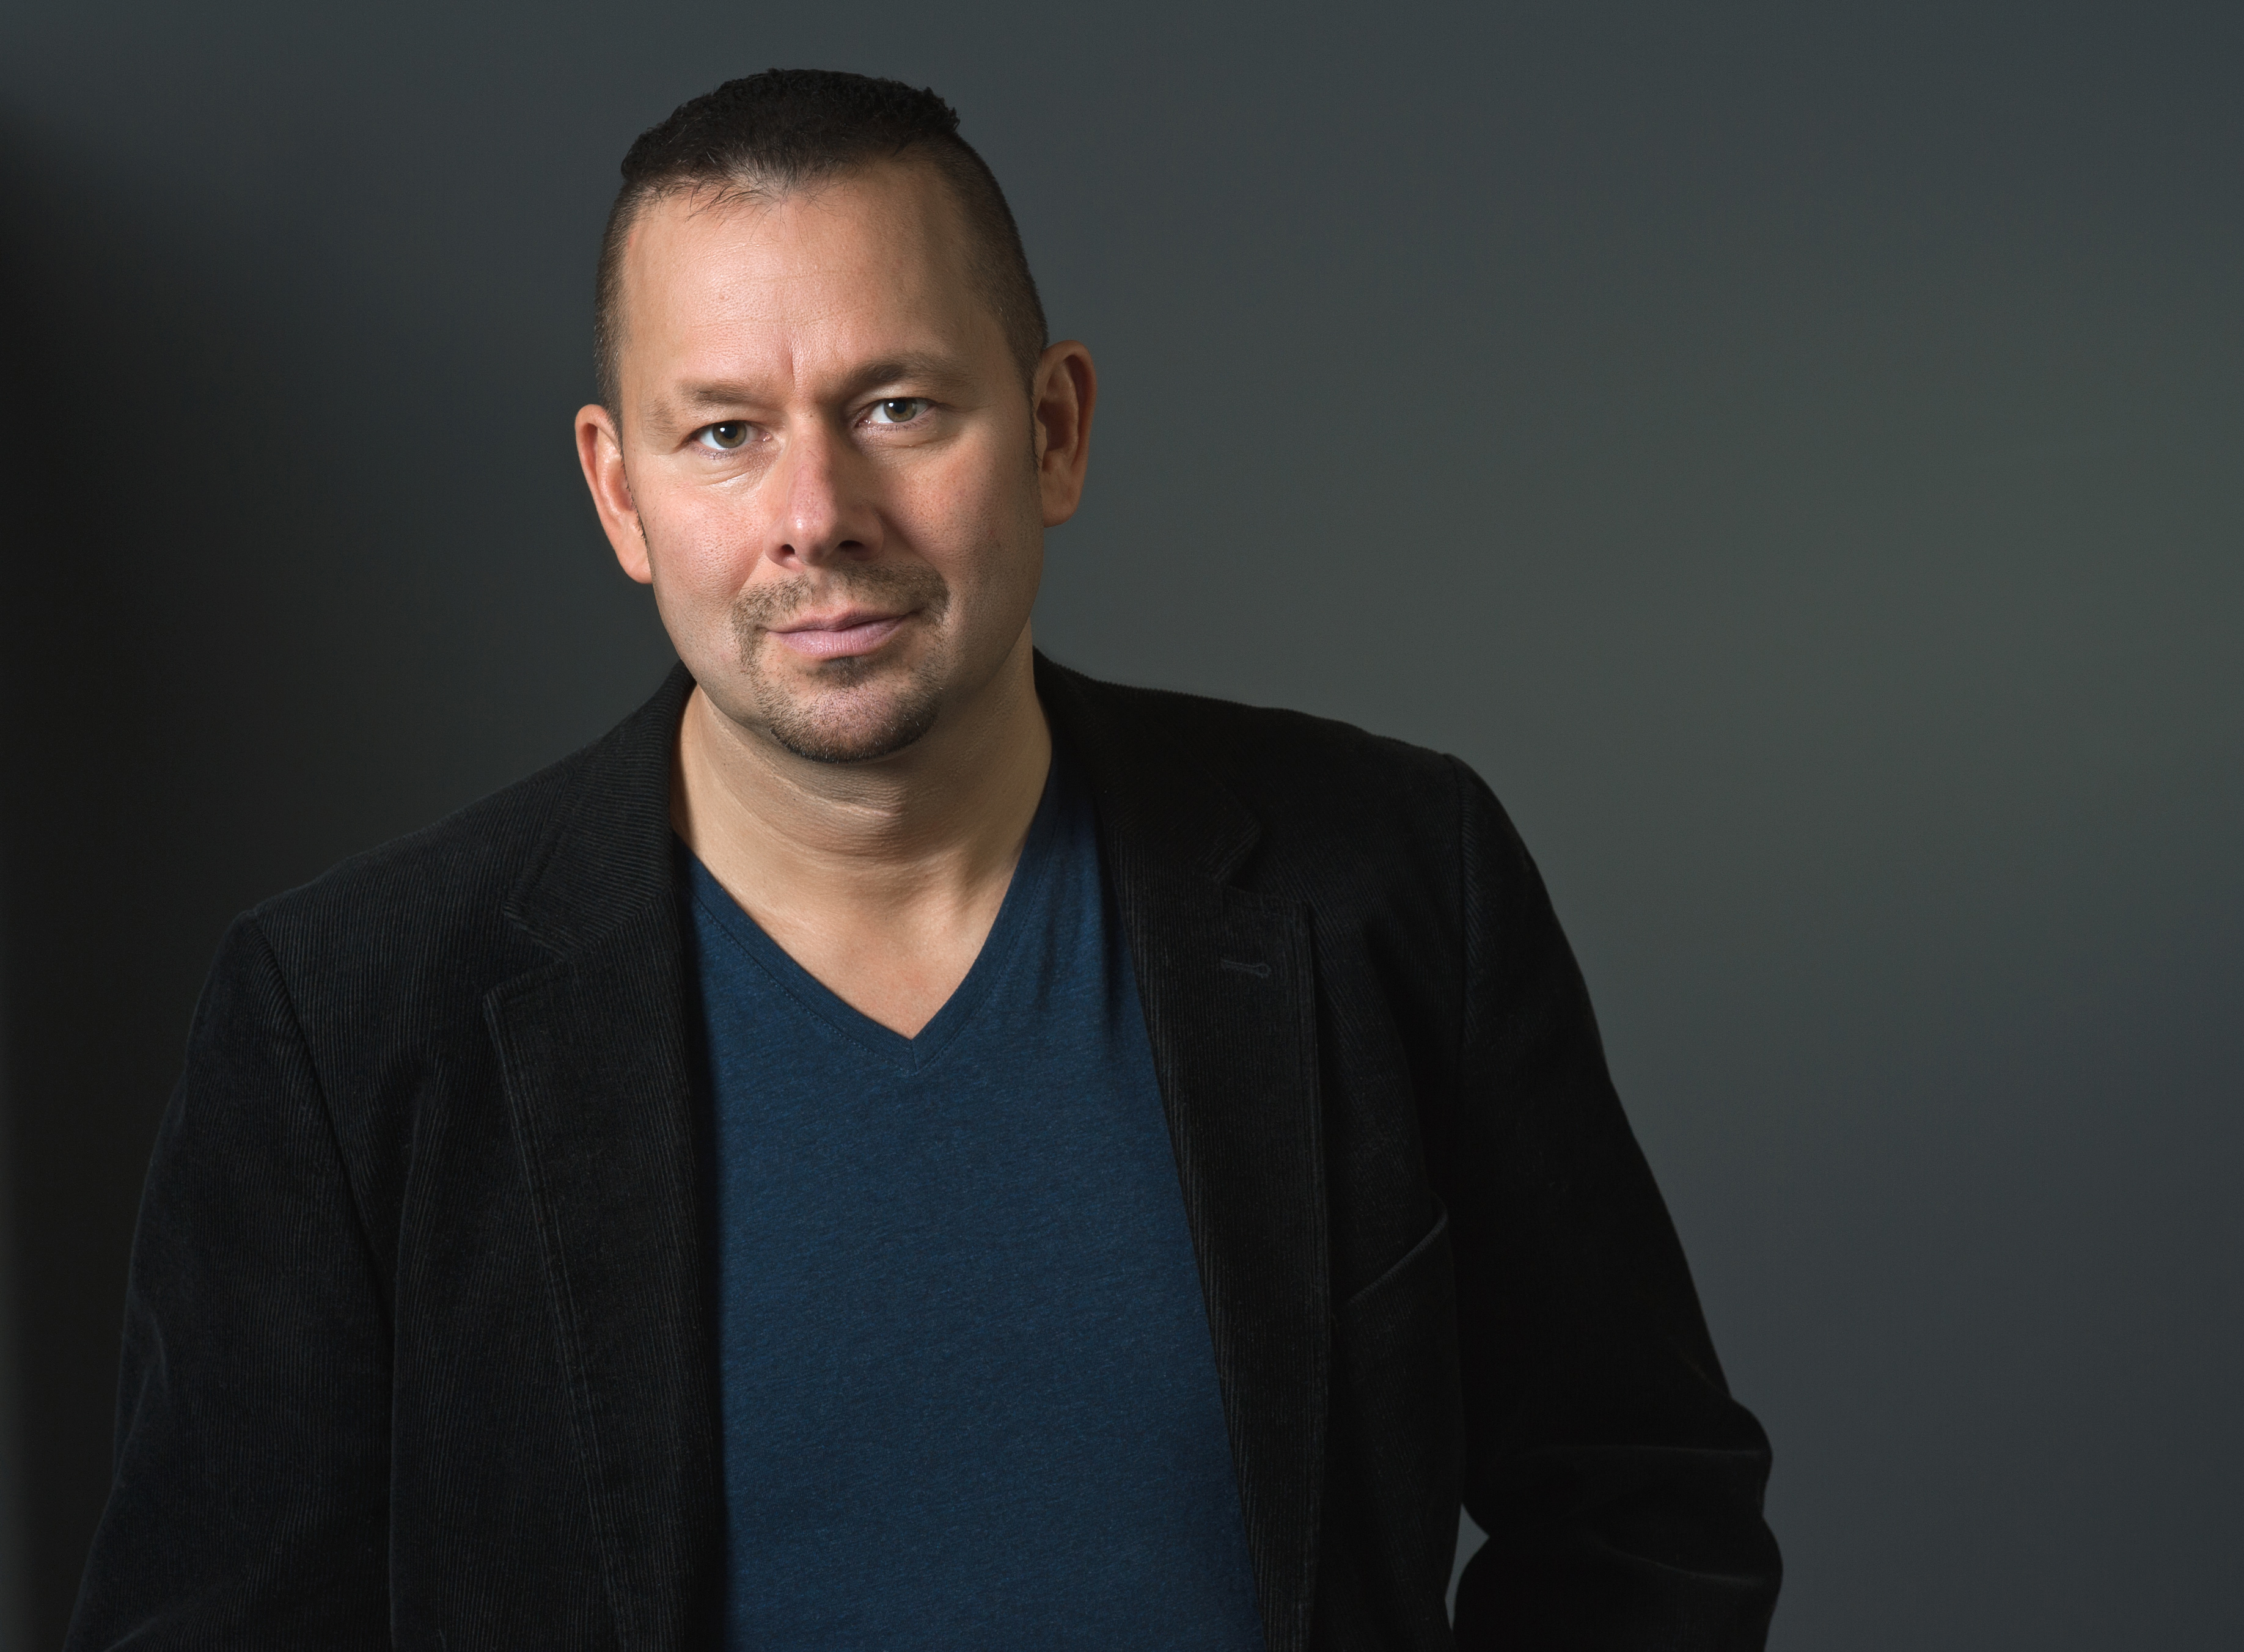 Marko Märtin